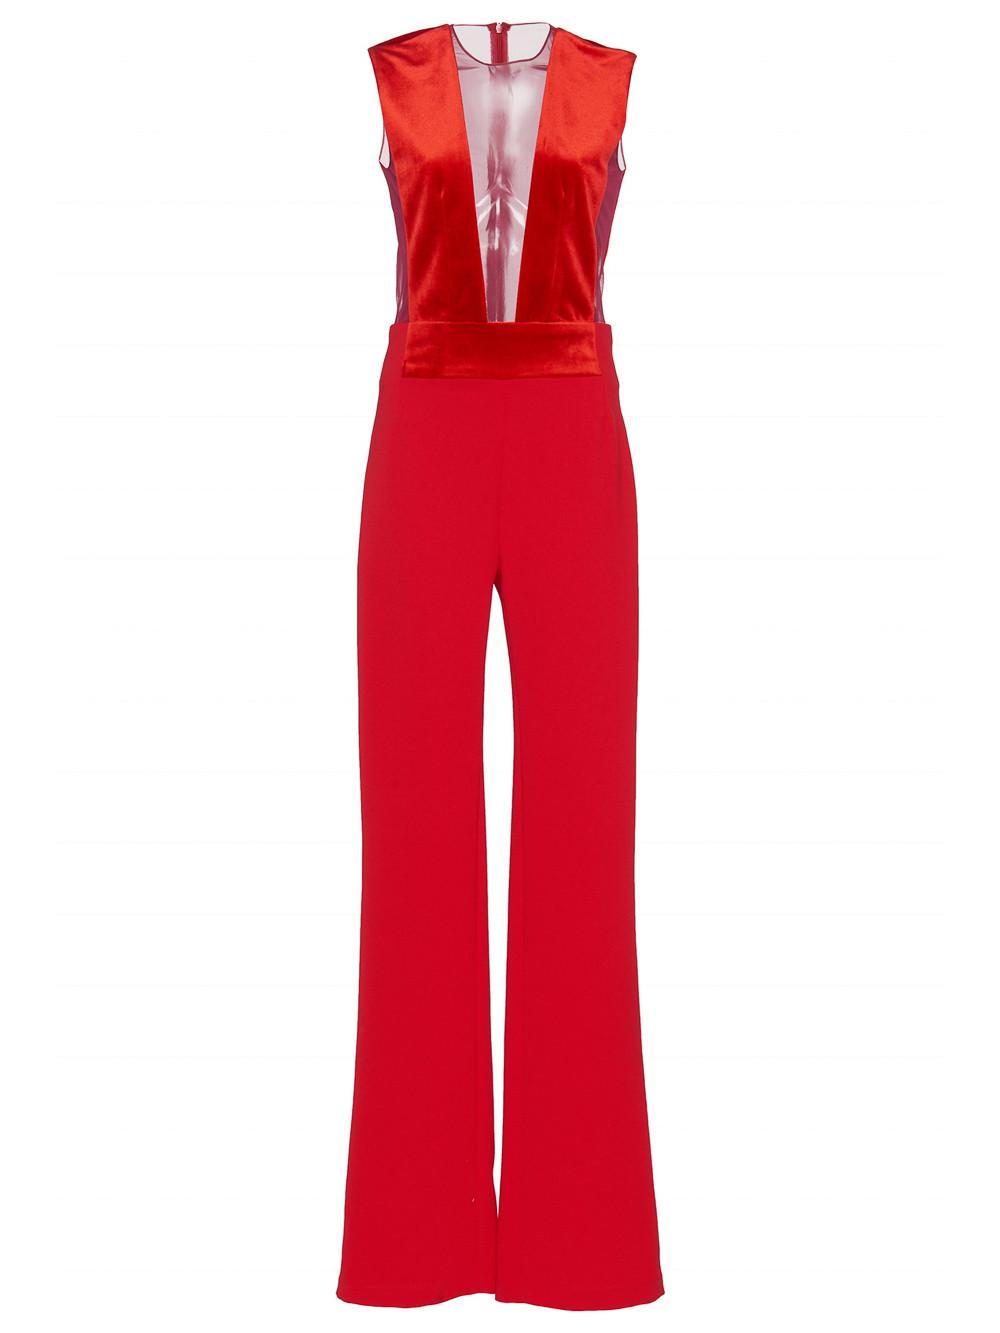 0aad3474fede Galvan Gwyneth Velvet And Tulle-Paneled Crepe Jumpsuit In Red